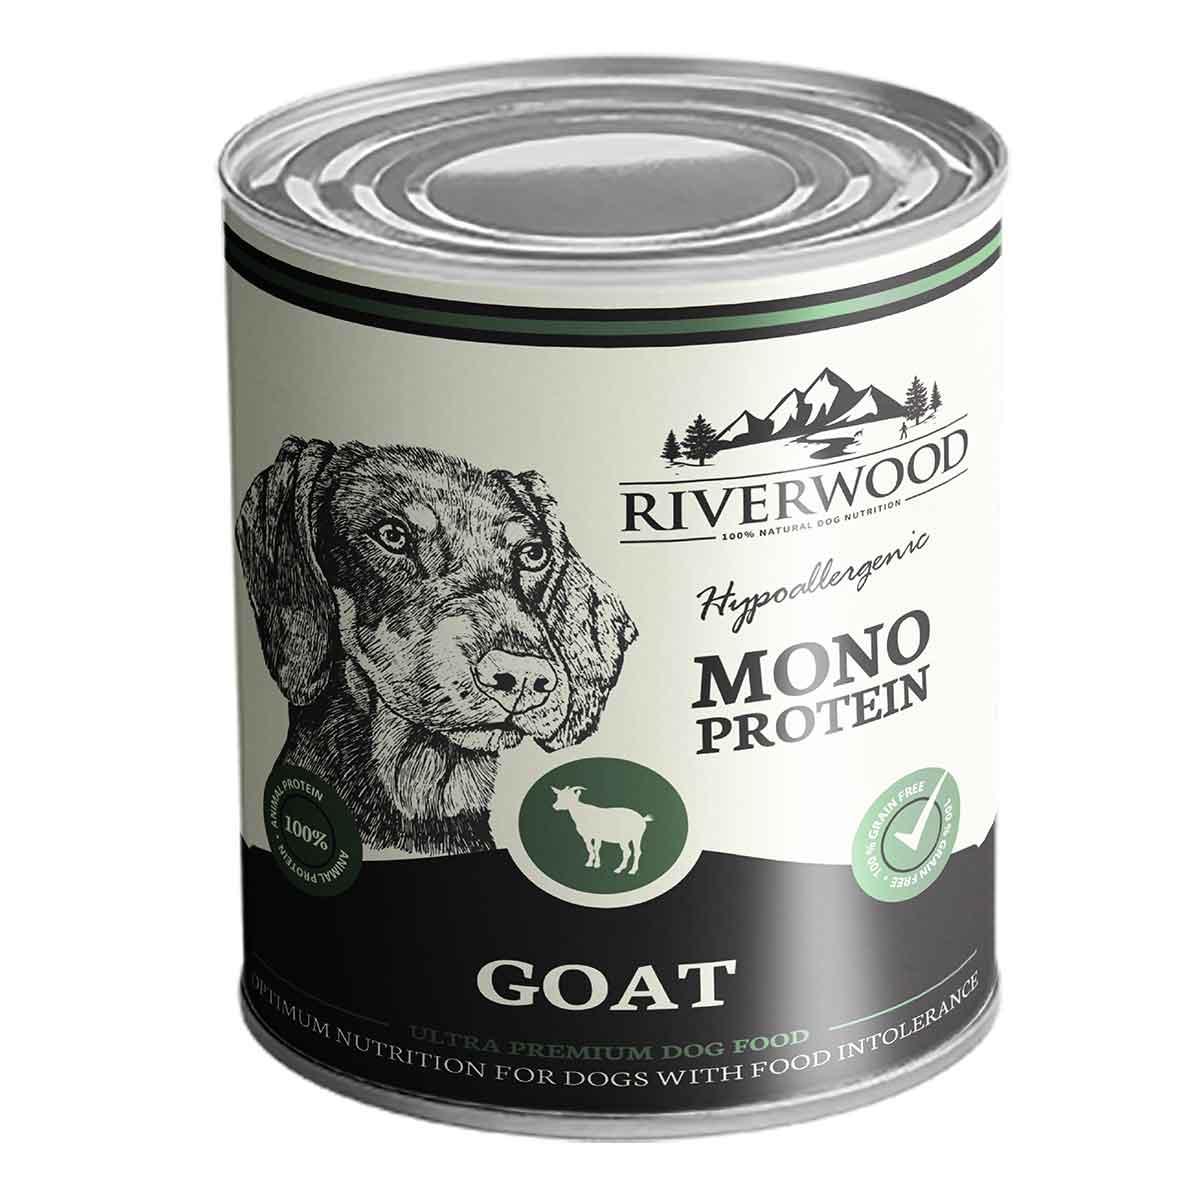 Mono Proteïne Goat